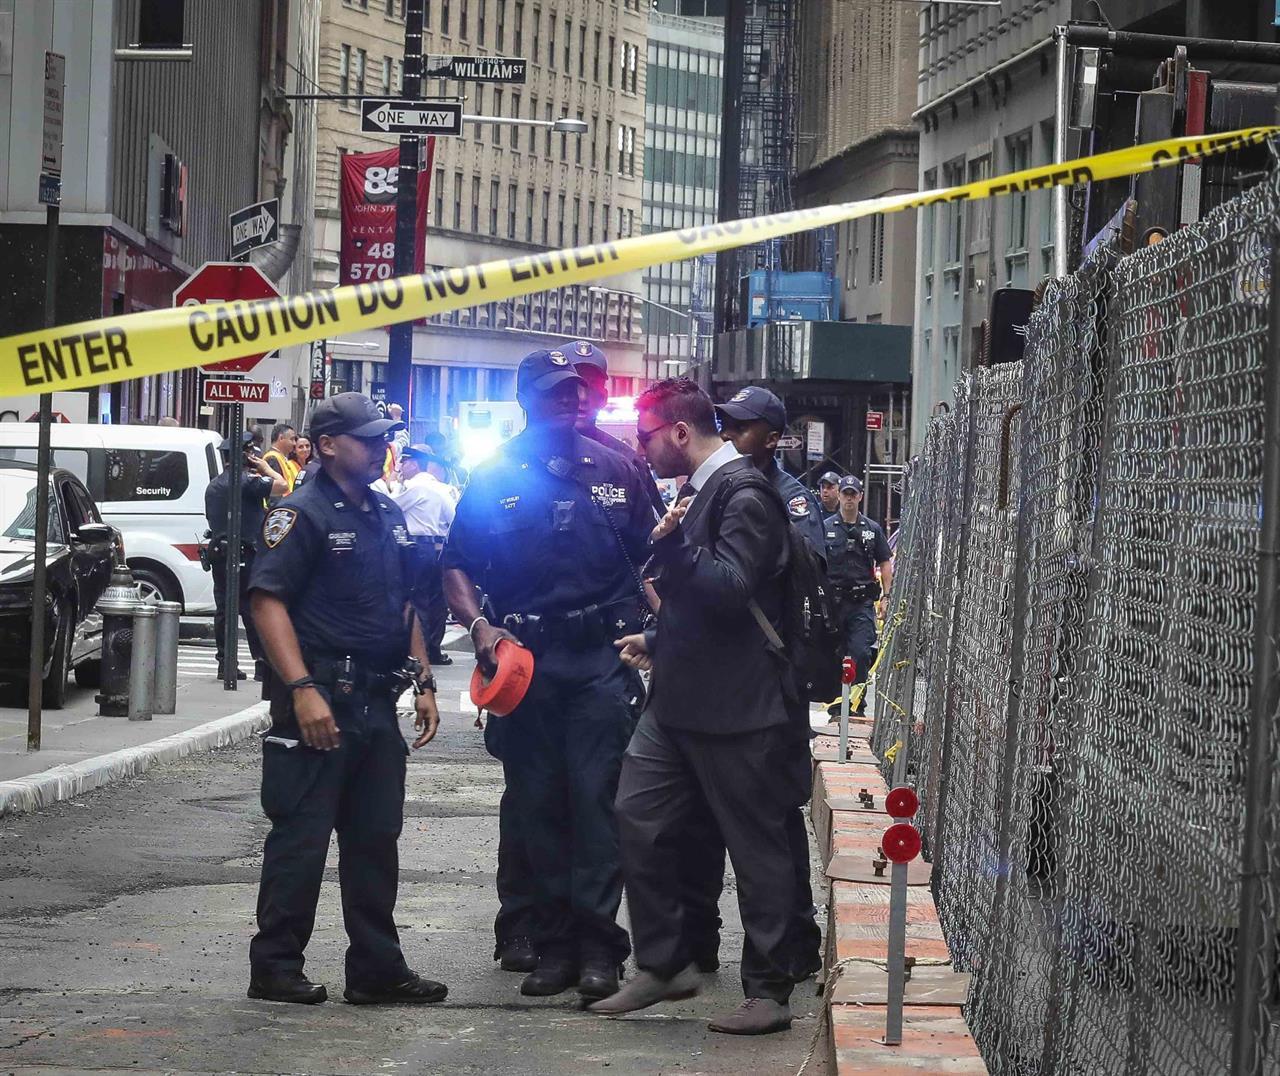 New York City subway scare suspect taken into police custody